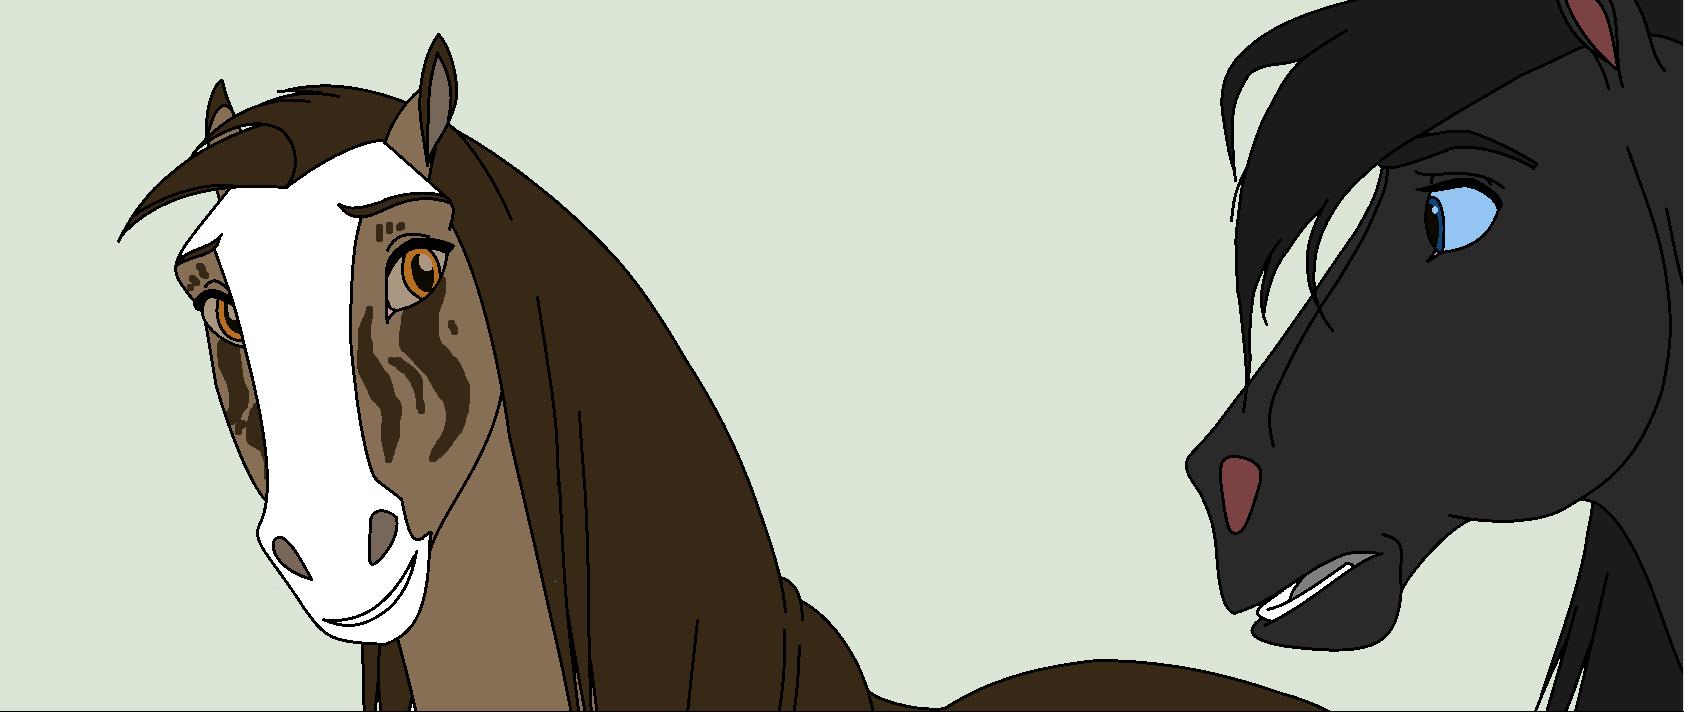 Random Art #2 - Warrior Cats as Horses #1 - Wattpad